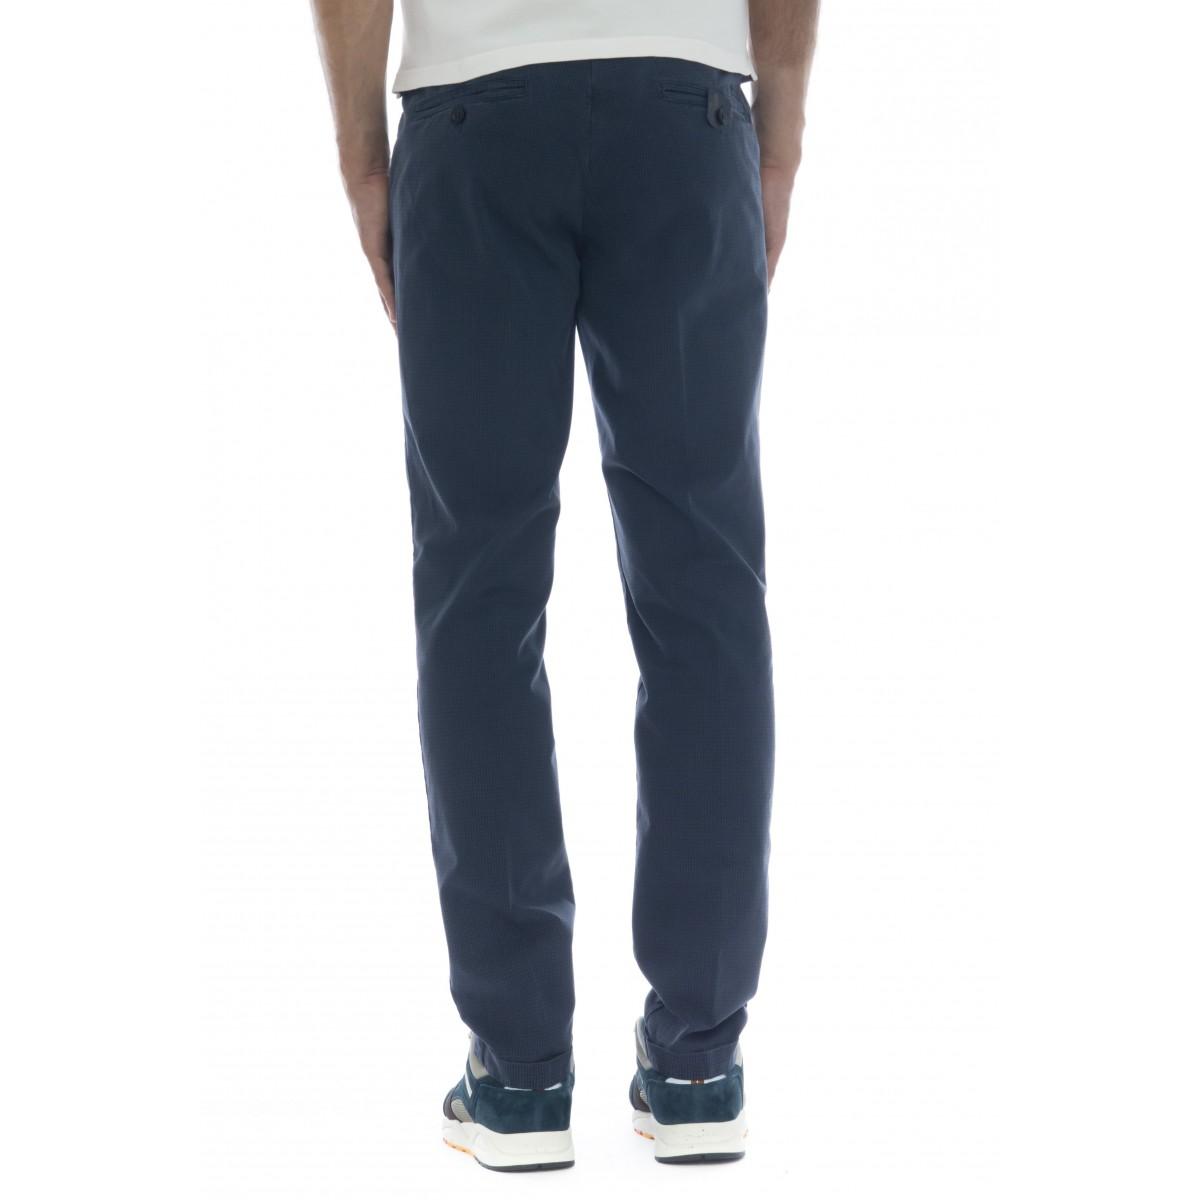 Pantalone uomo - Lenny 5602 microfantasia